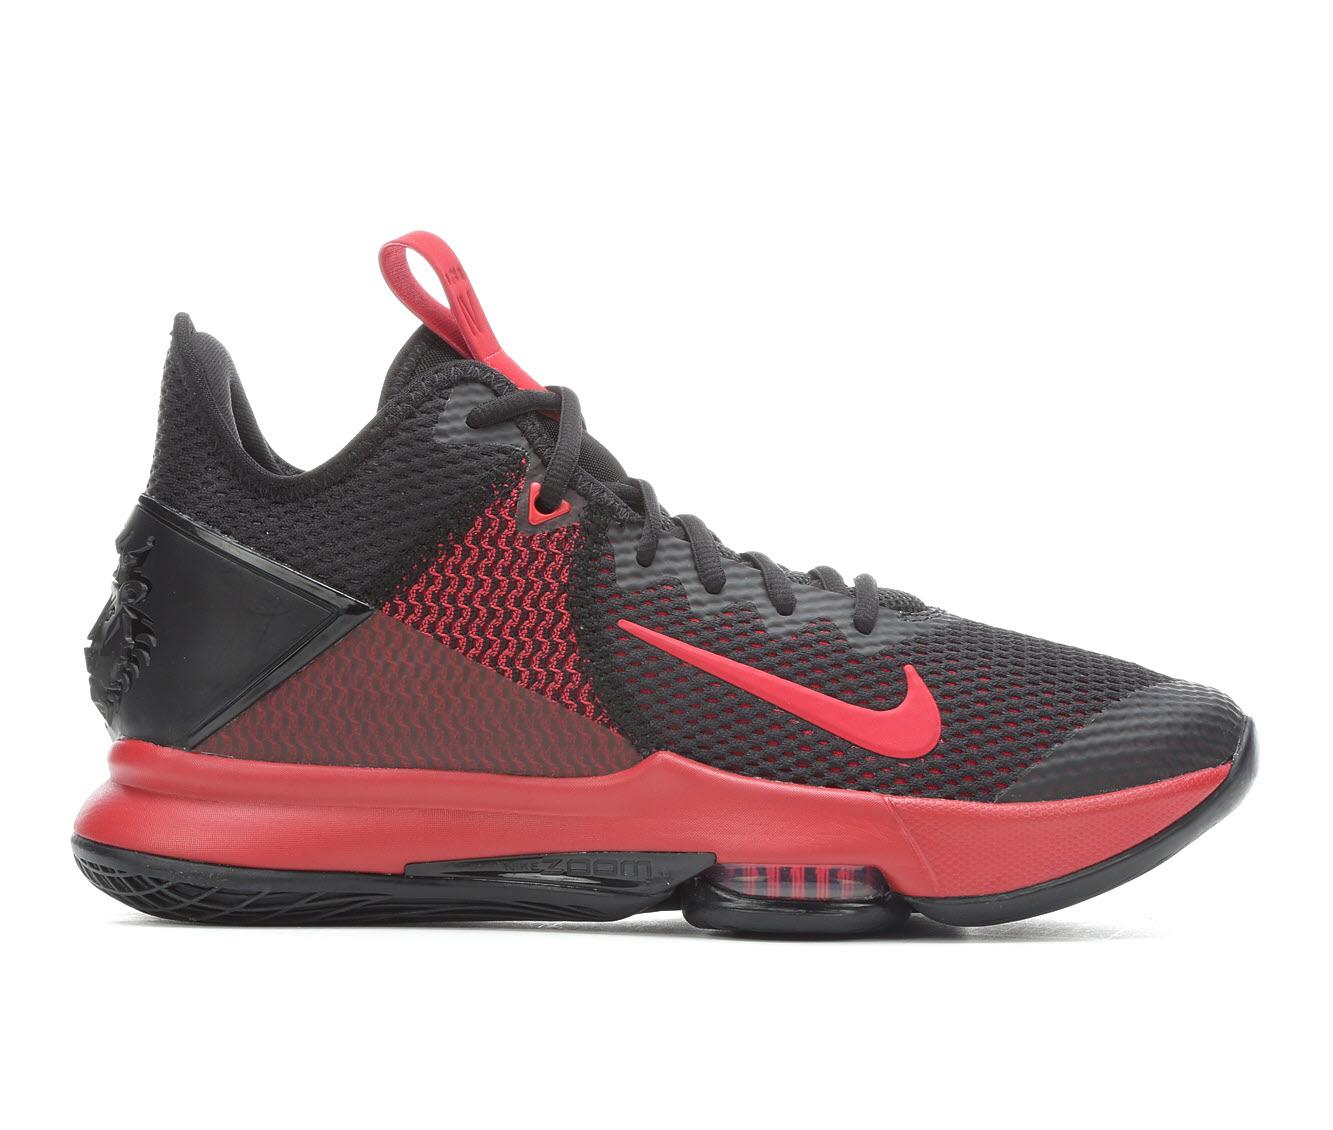 Nike Lebron Witness IV Basketball Shoes